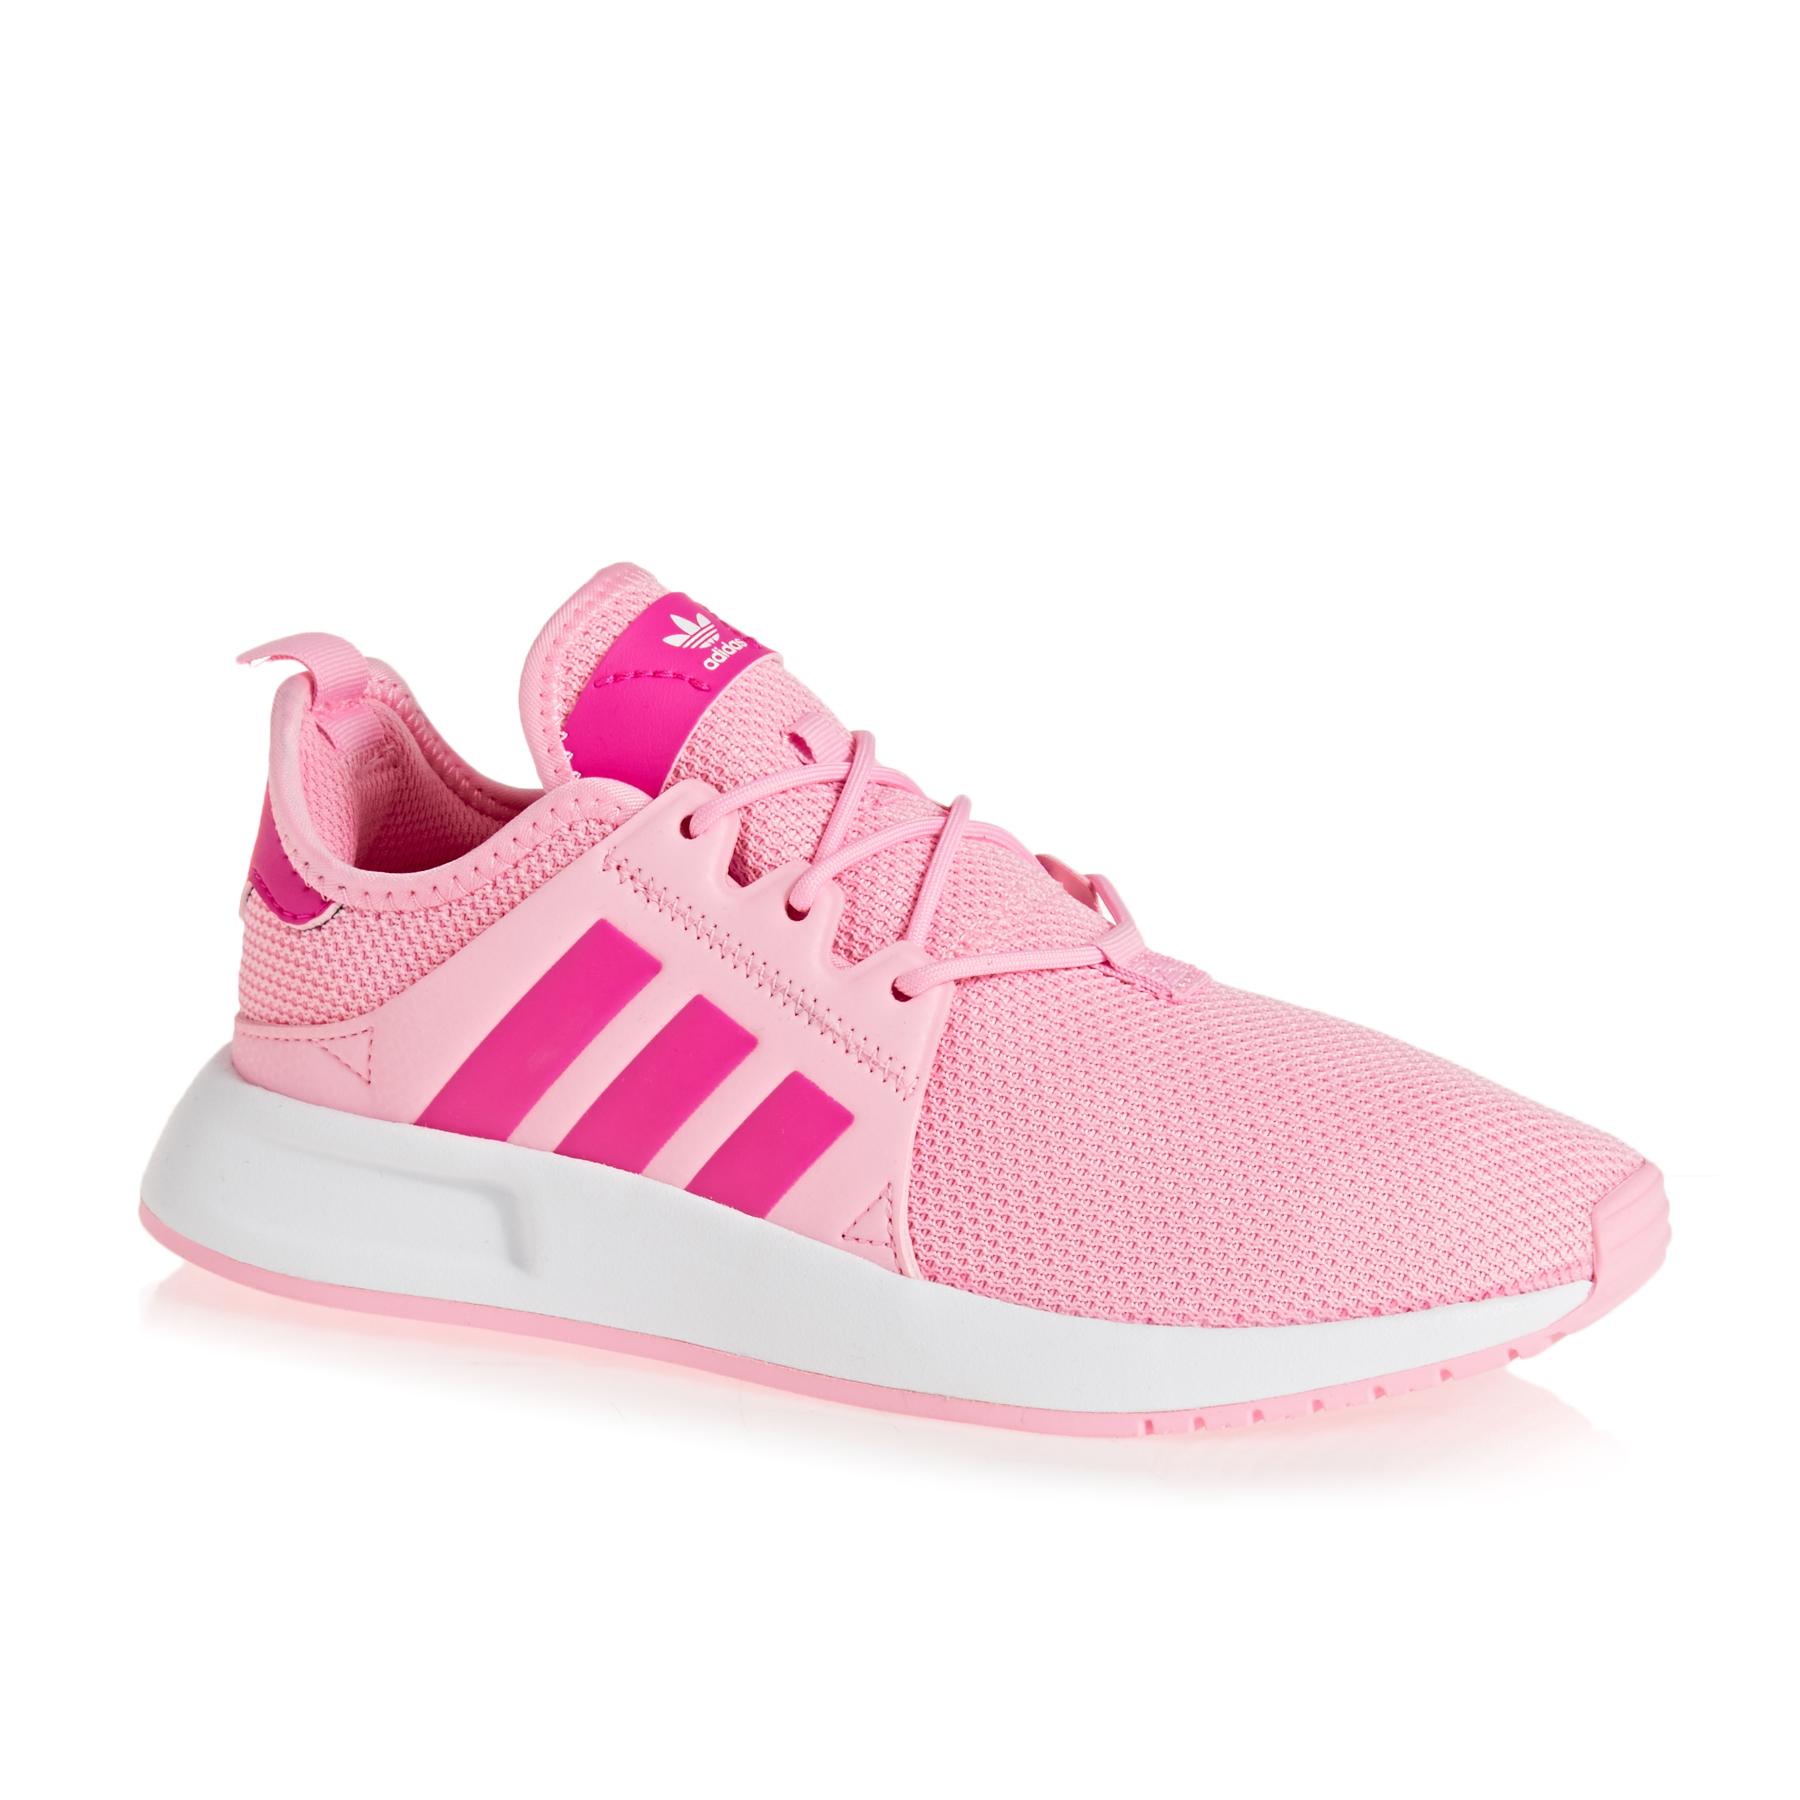 Adidas Originals XPLR J Kids Shoes Free Delivery options